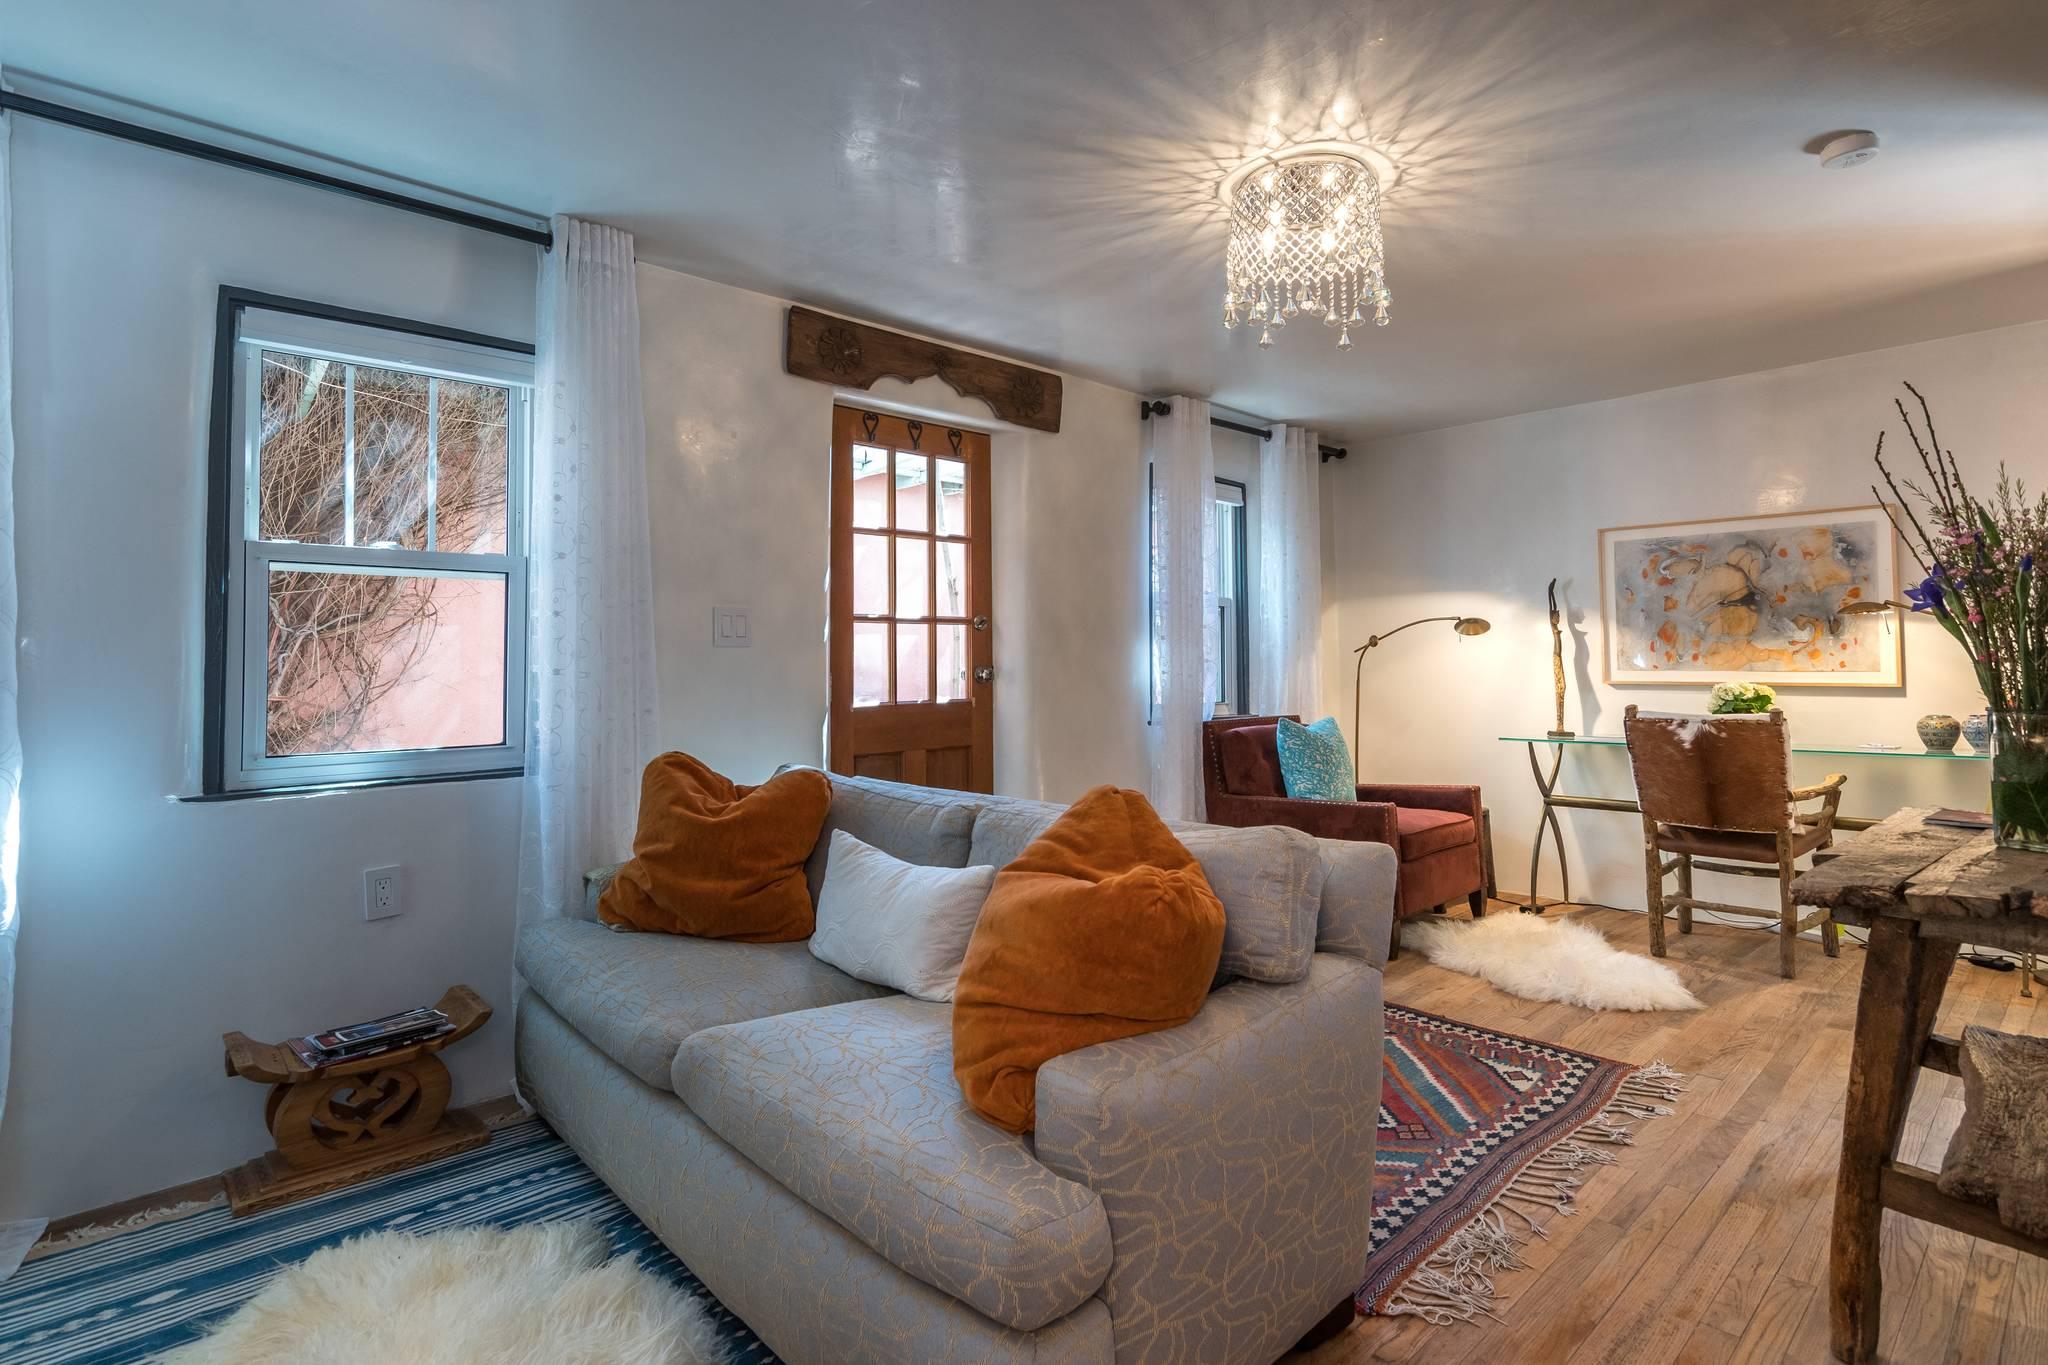 Phenomenal Casita Ortega Santa Fe Rental Santa Fe Luxury Rental Dailytribune Chair Design For Home Dailytribuneorg